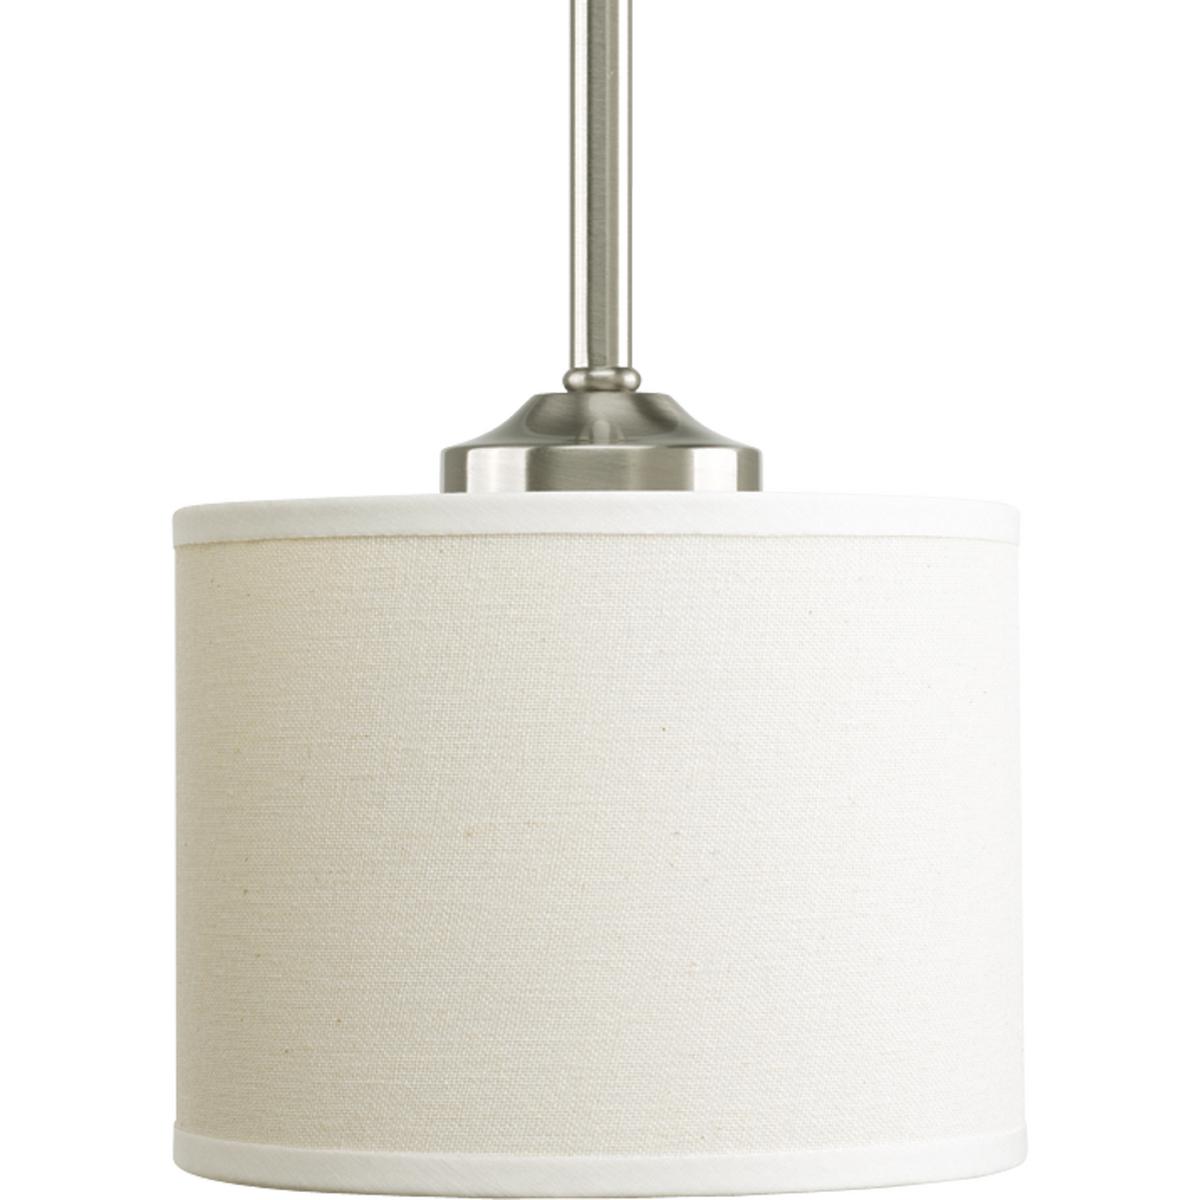 PRO P5065-09 1X100M Brushed Nickel Beige Linen Drum Shade Mini Pendant